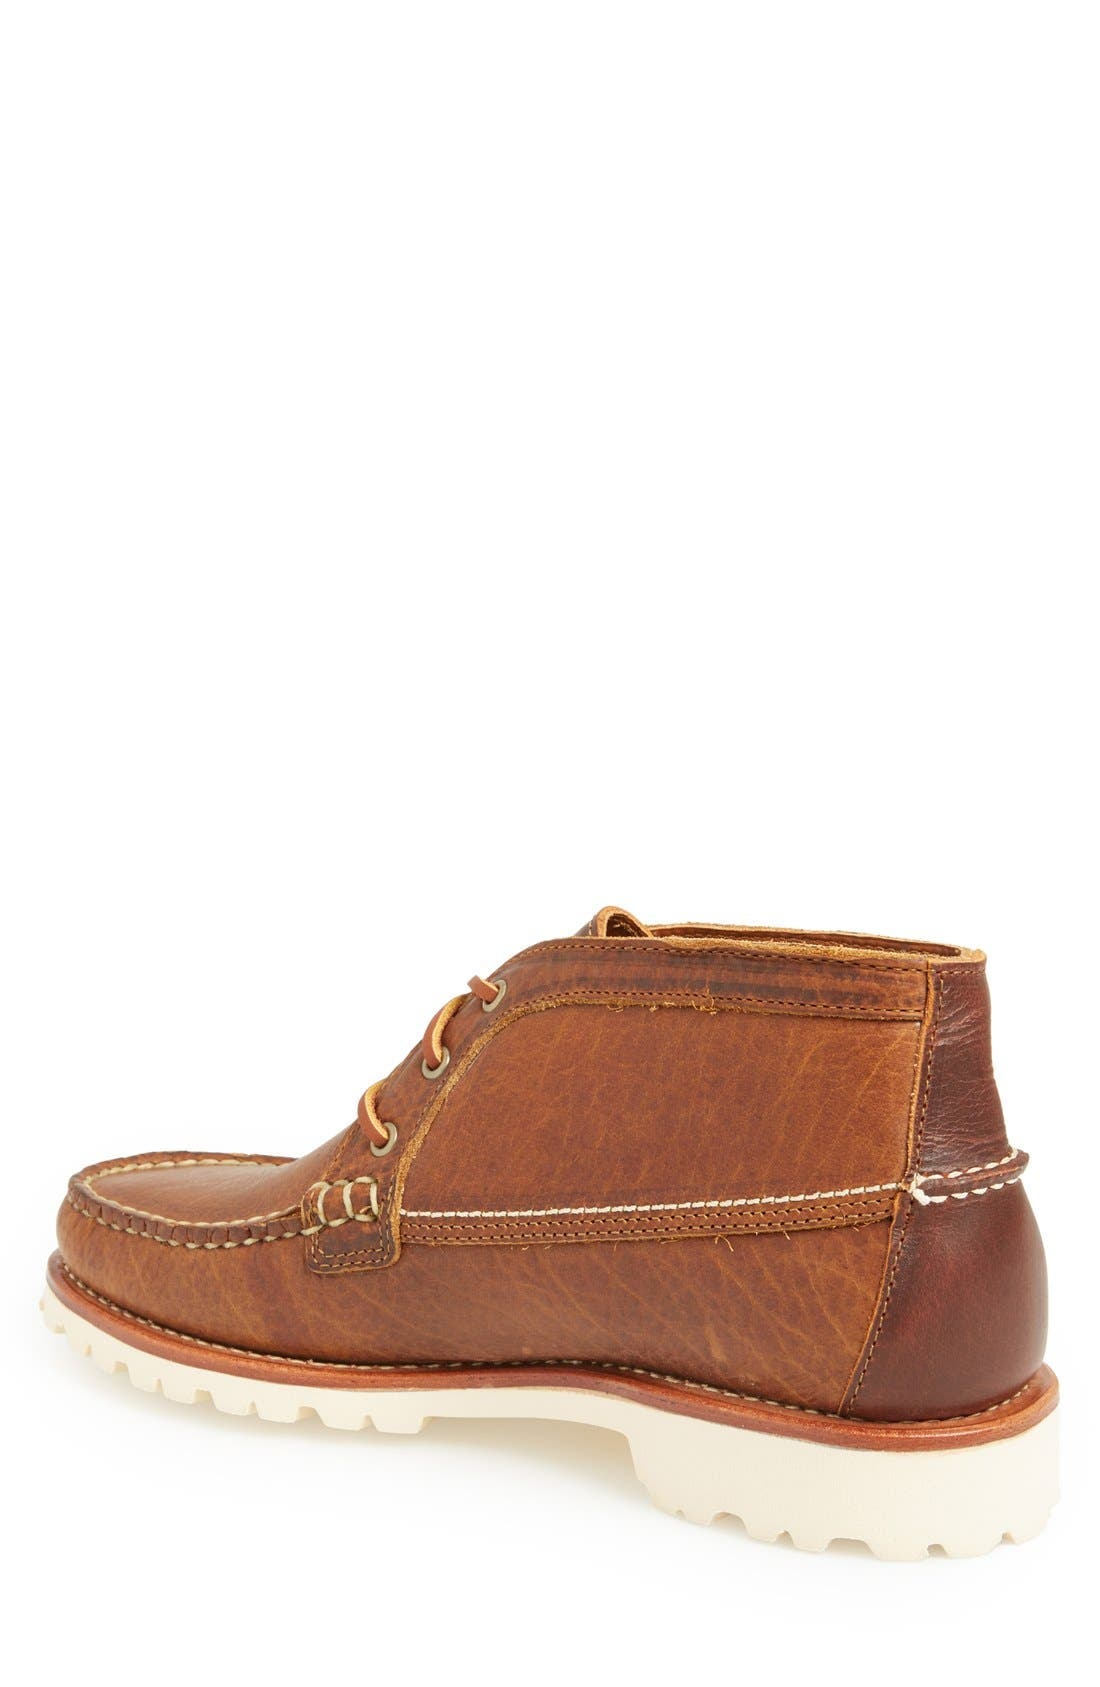 'Charlo' Moc Toe Boot,                             Alternate thumbnail 2, color,                             Whiskey